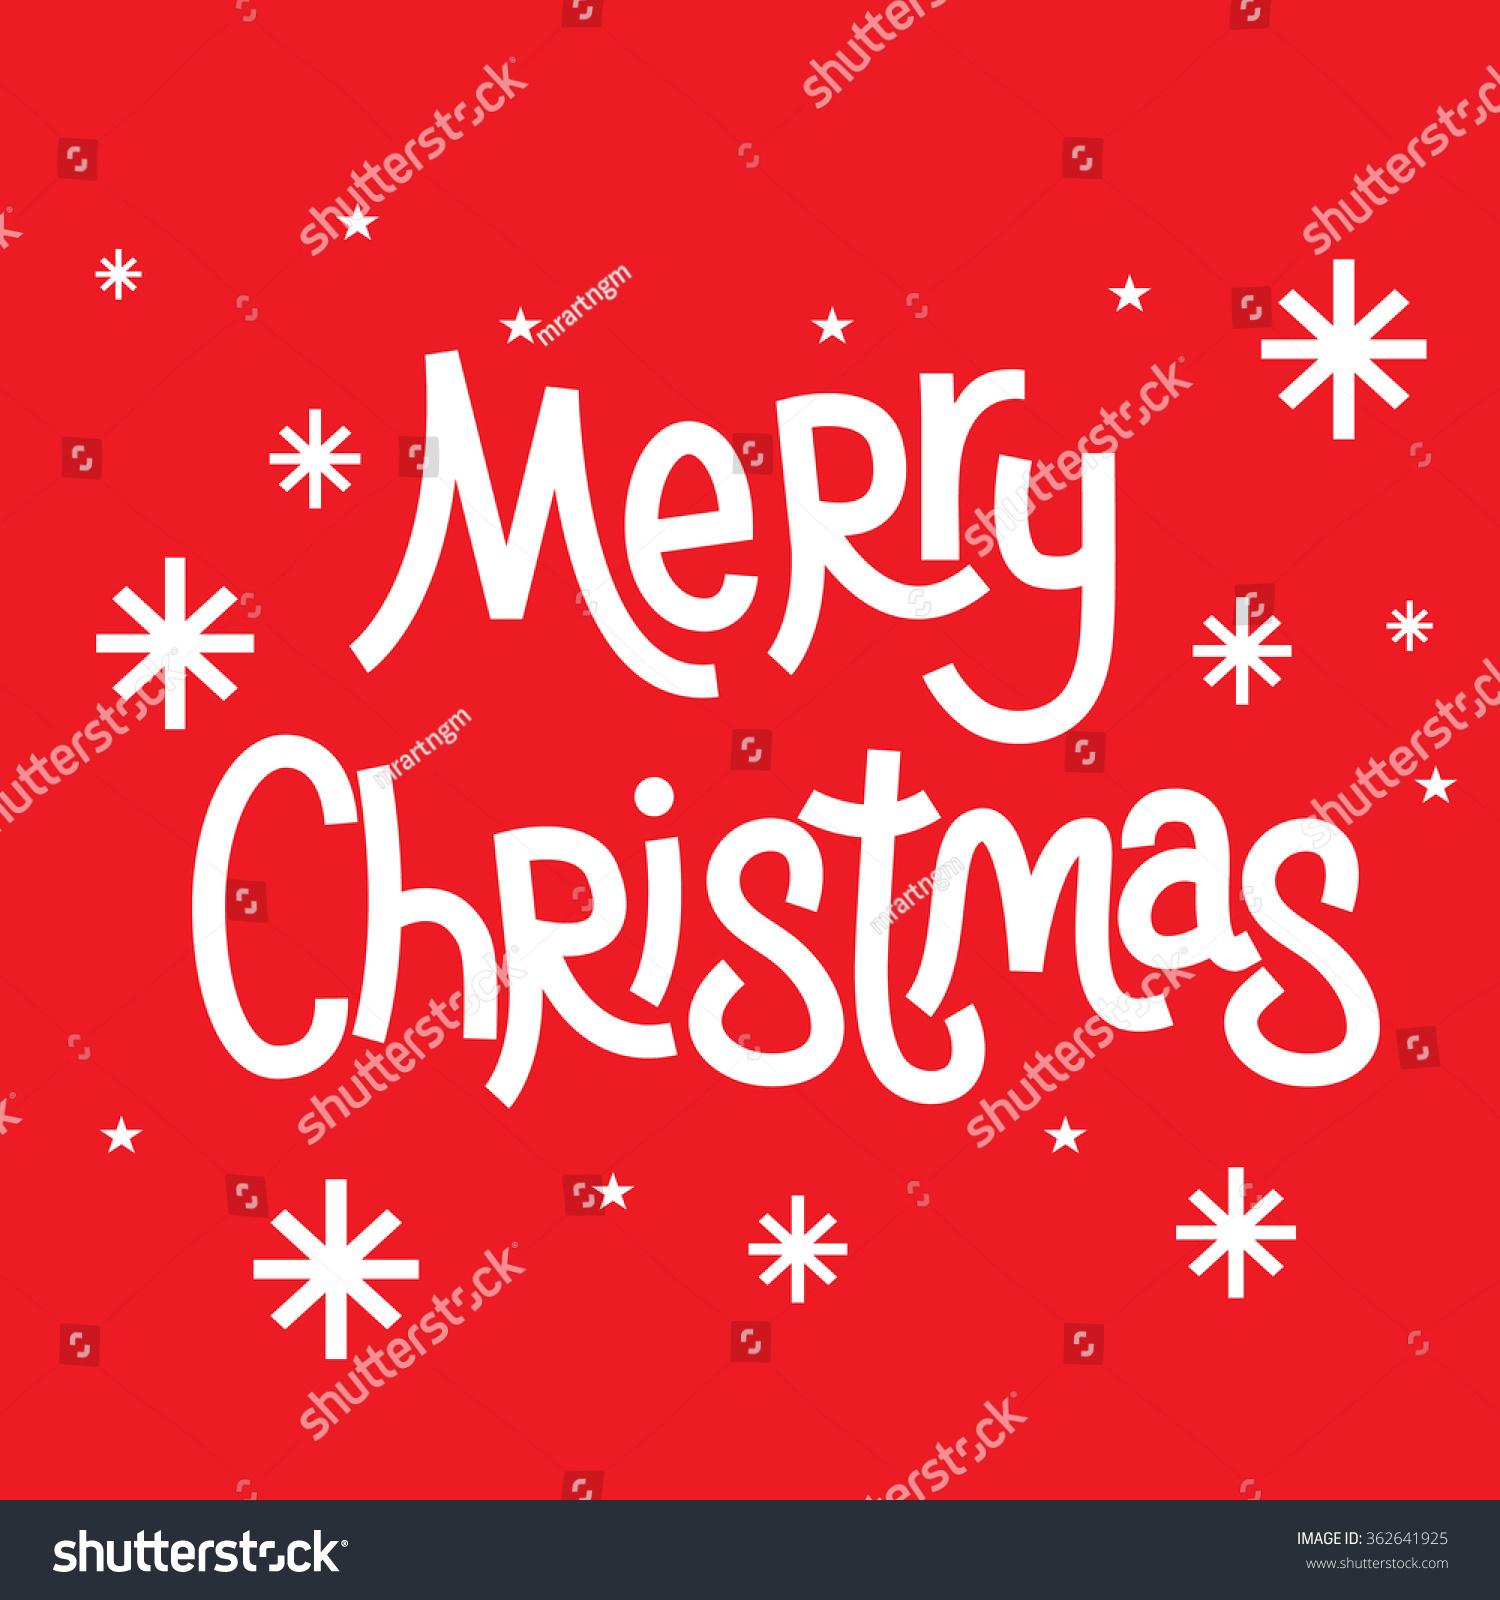 Christmas Greeting Words Merry Christmas Stock Vector 362641925